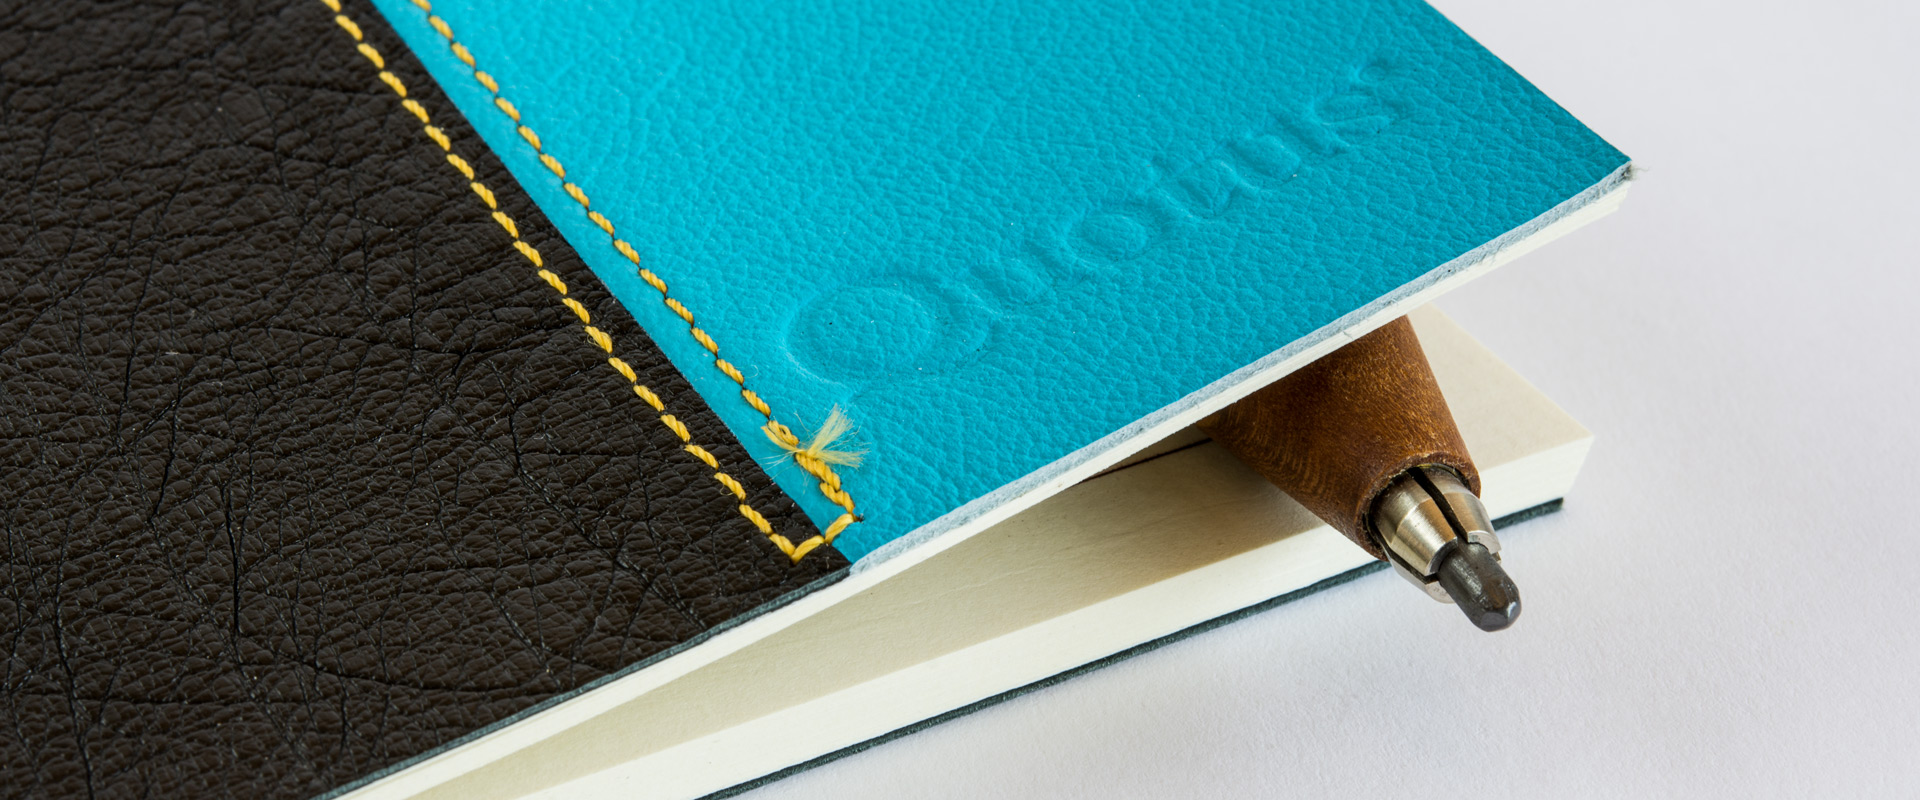 diario tascabile